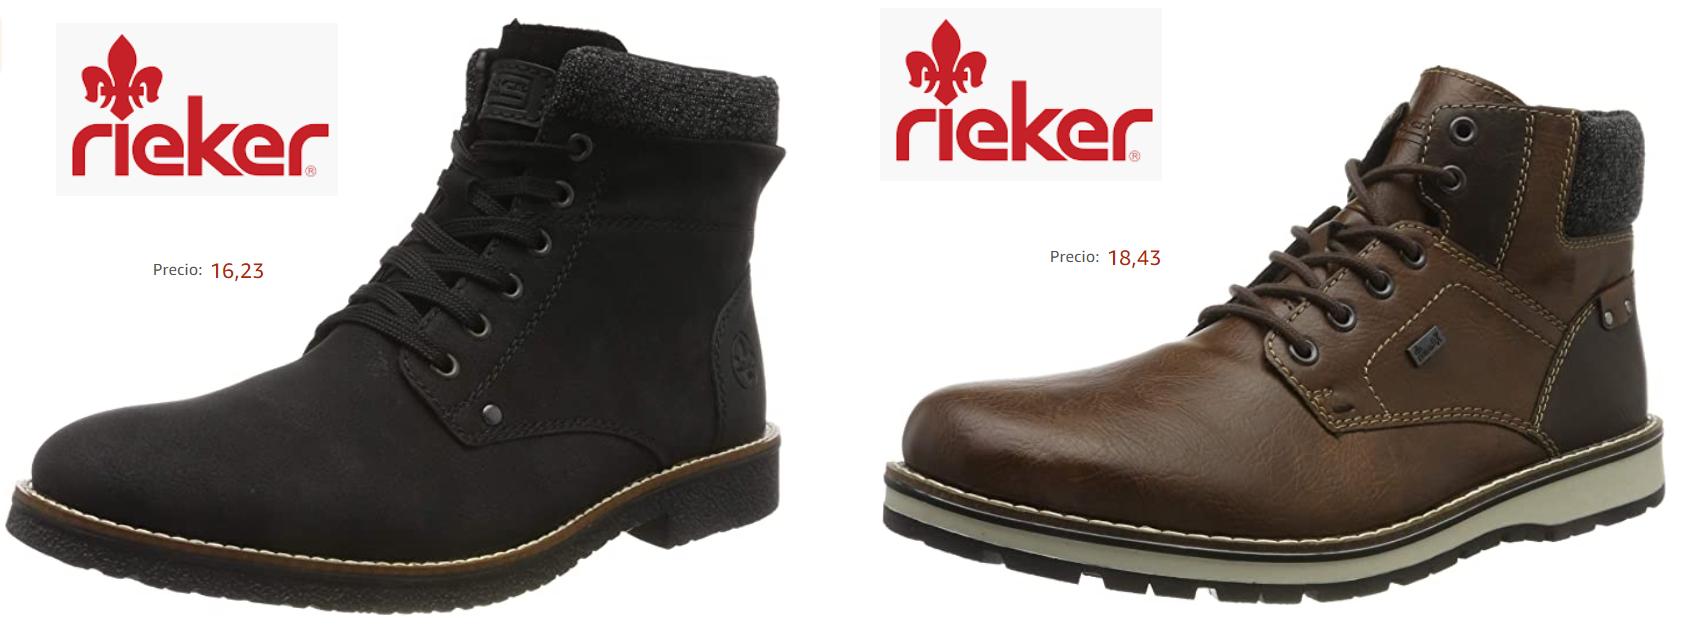 (2 COLORES) - TALLA 40 - Rieker 03011, Botas para Hombre (Desde 16.23€)